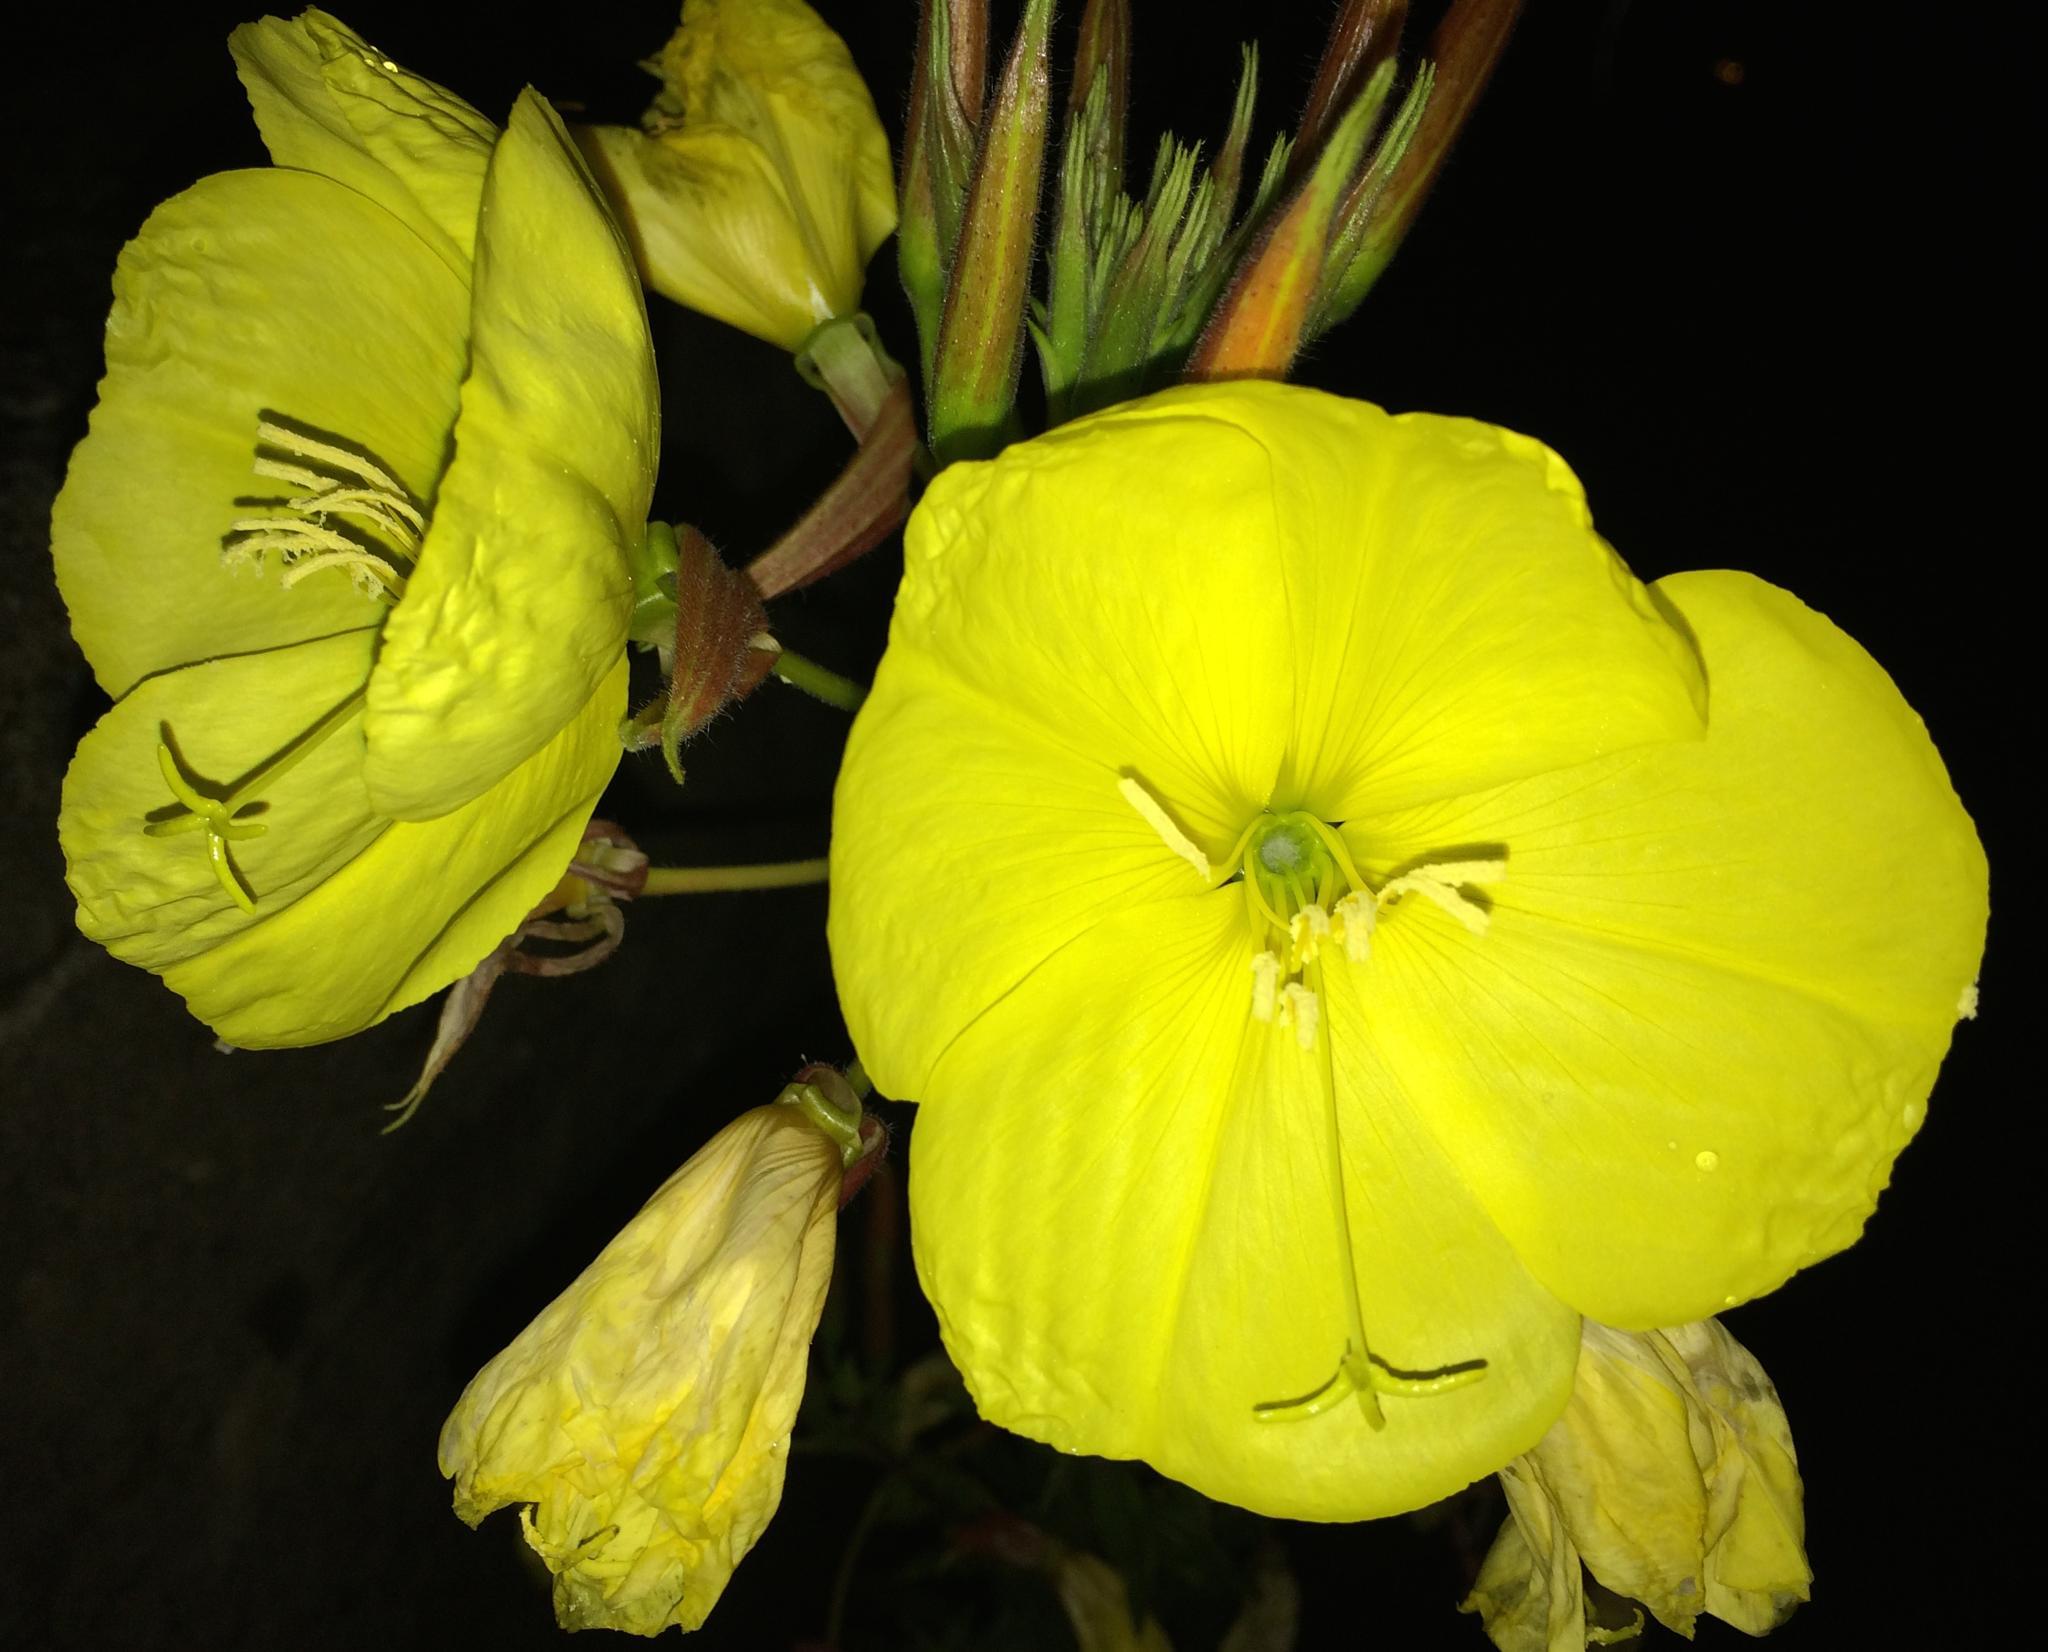 evening primrose at night by m.etemadieh